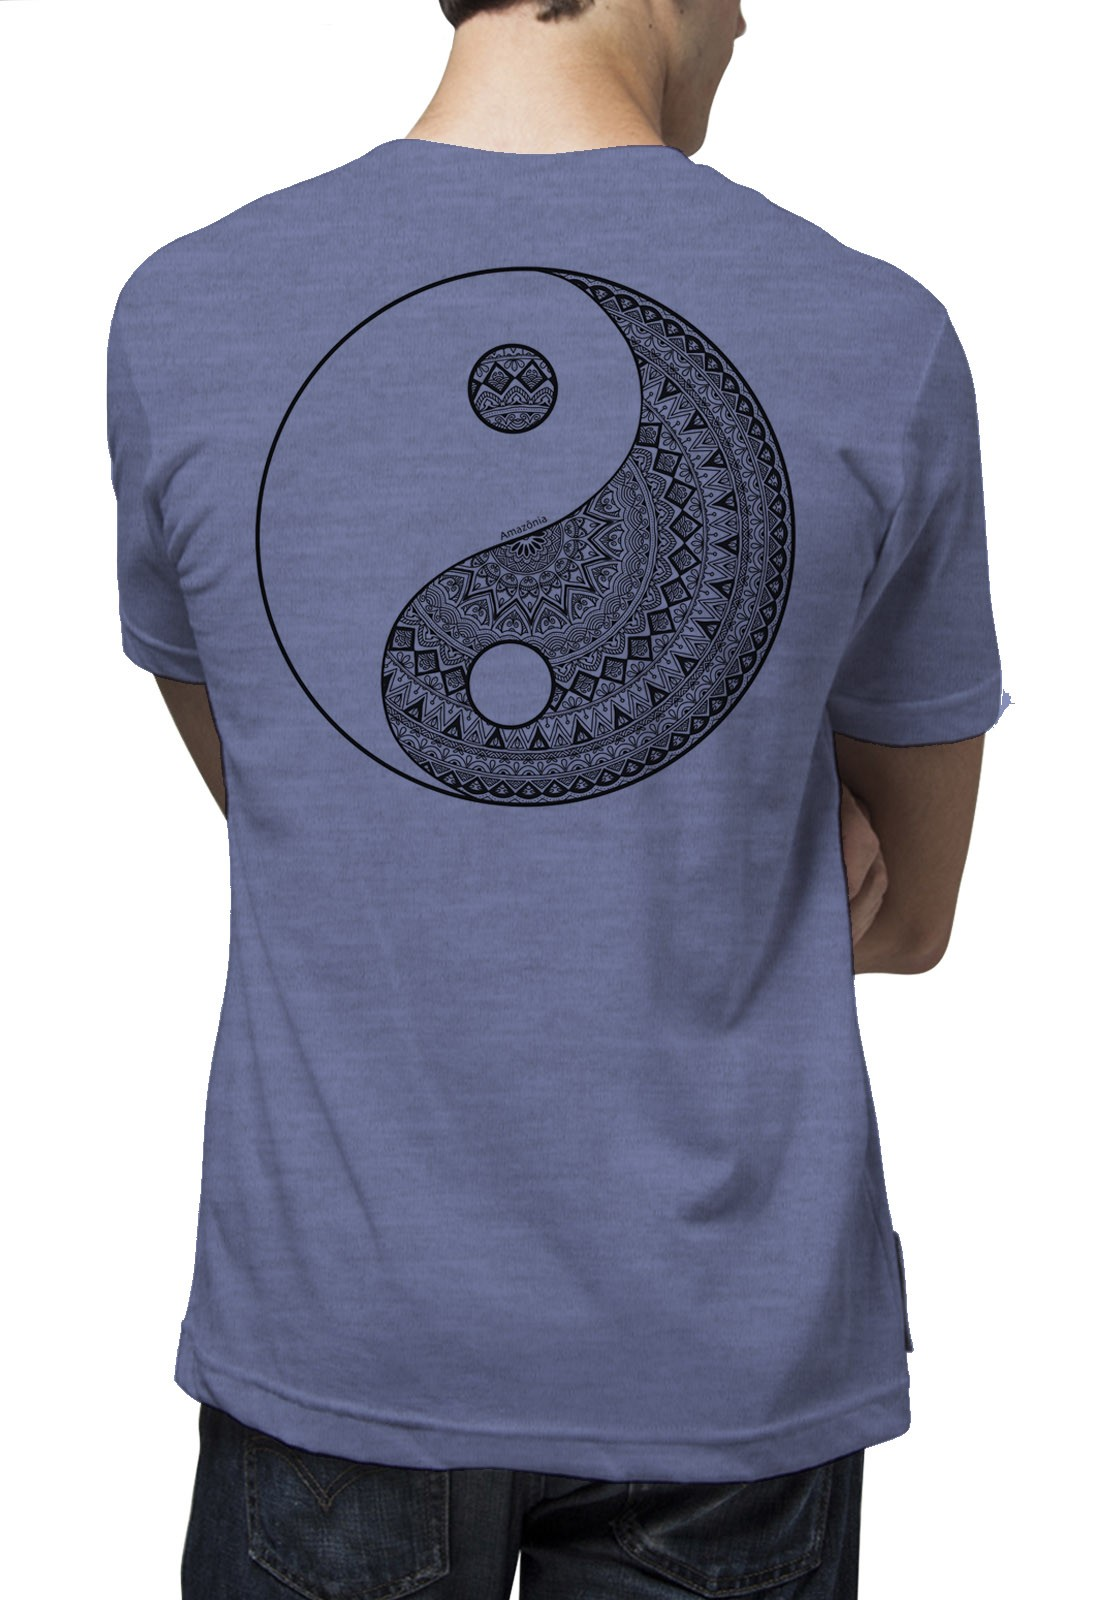 Camiseta Amazônia Yin Yang Tribal - Mescla Azul